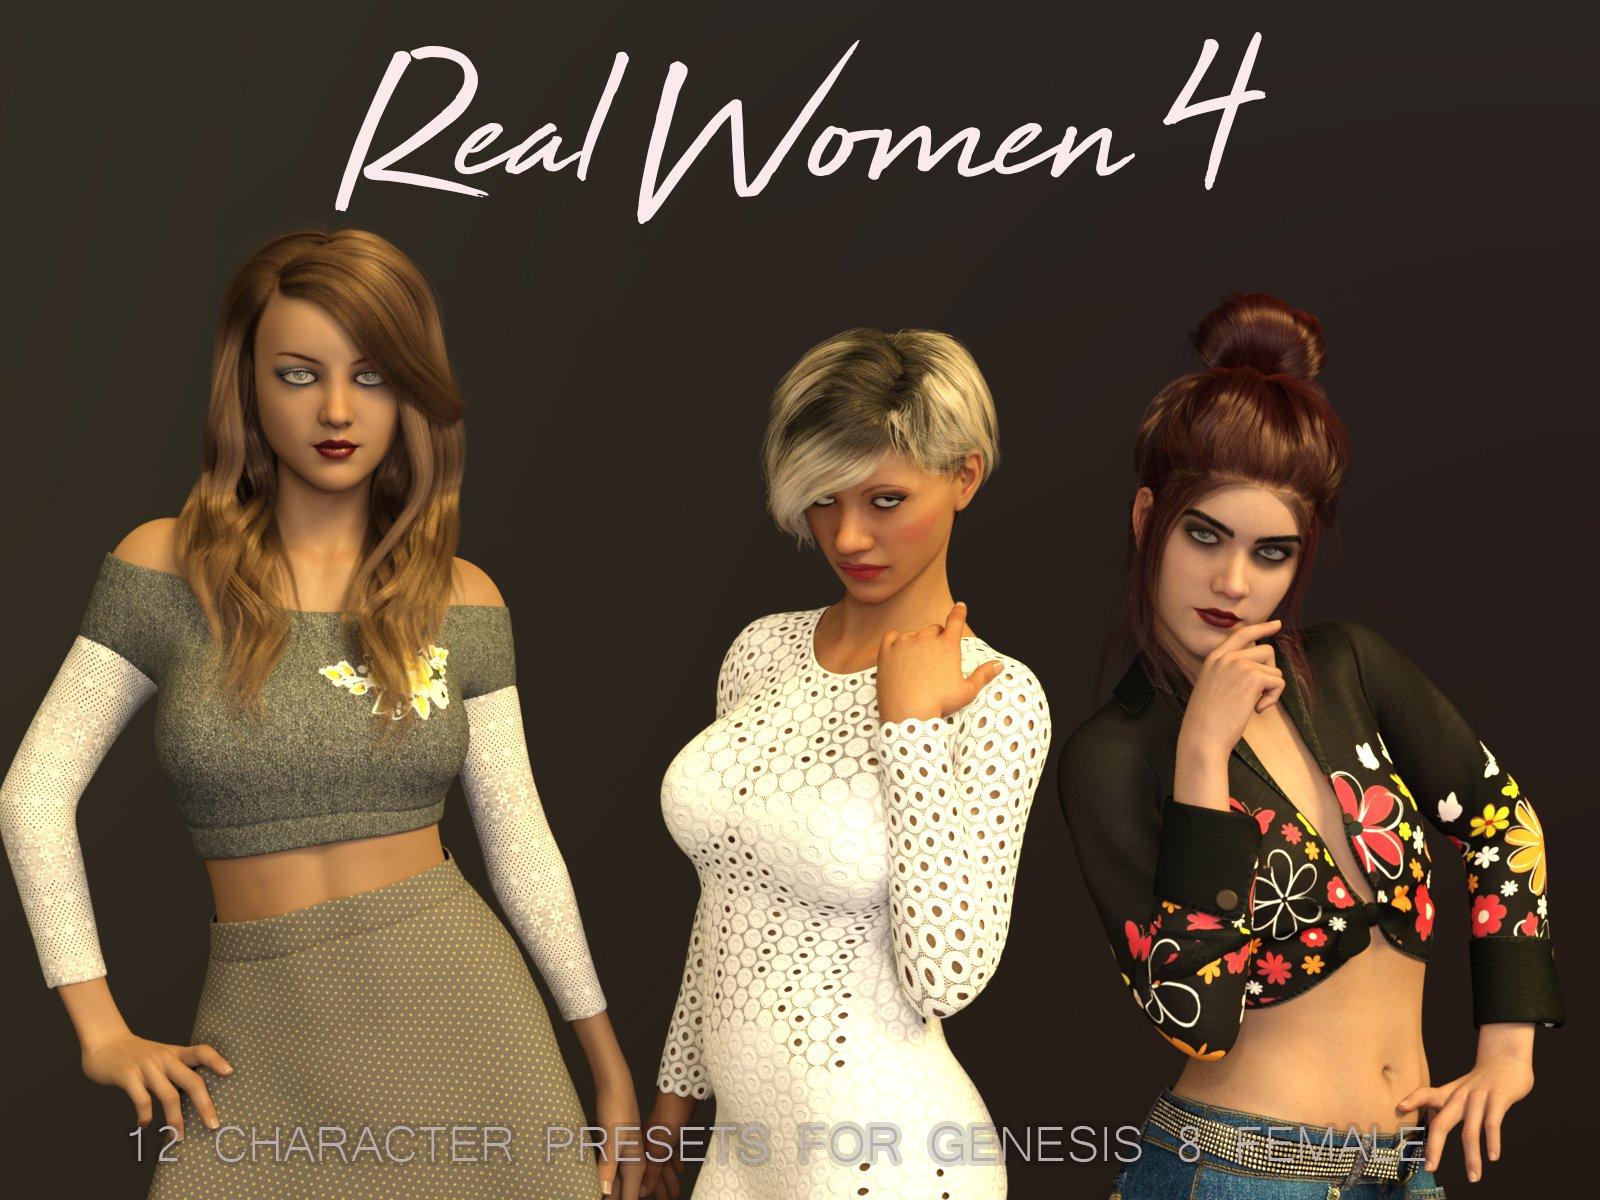 Real Women 4 for G8F_DAZ3D下载站